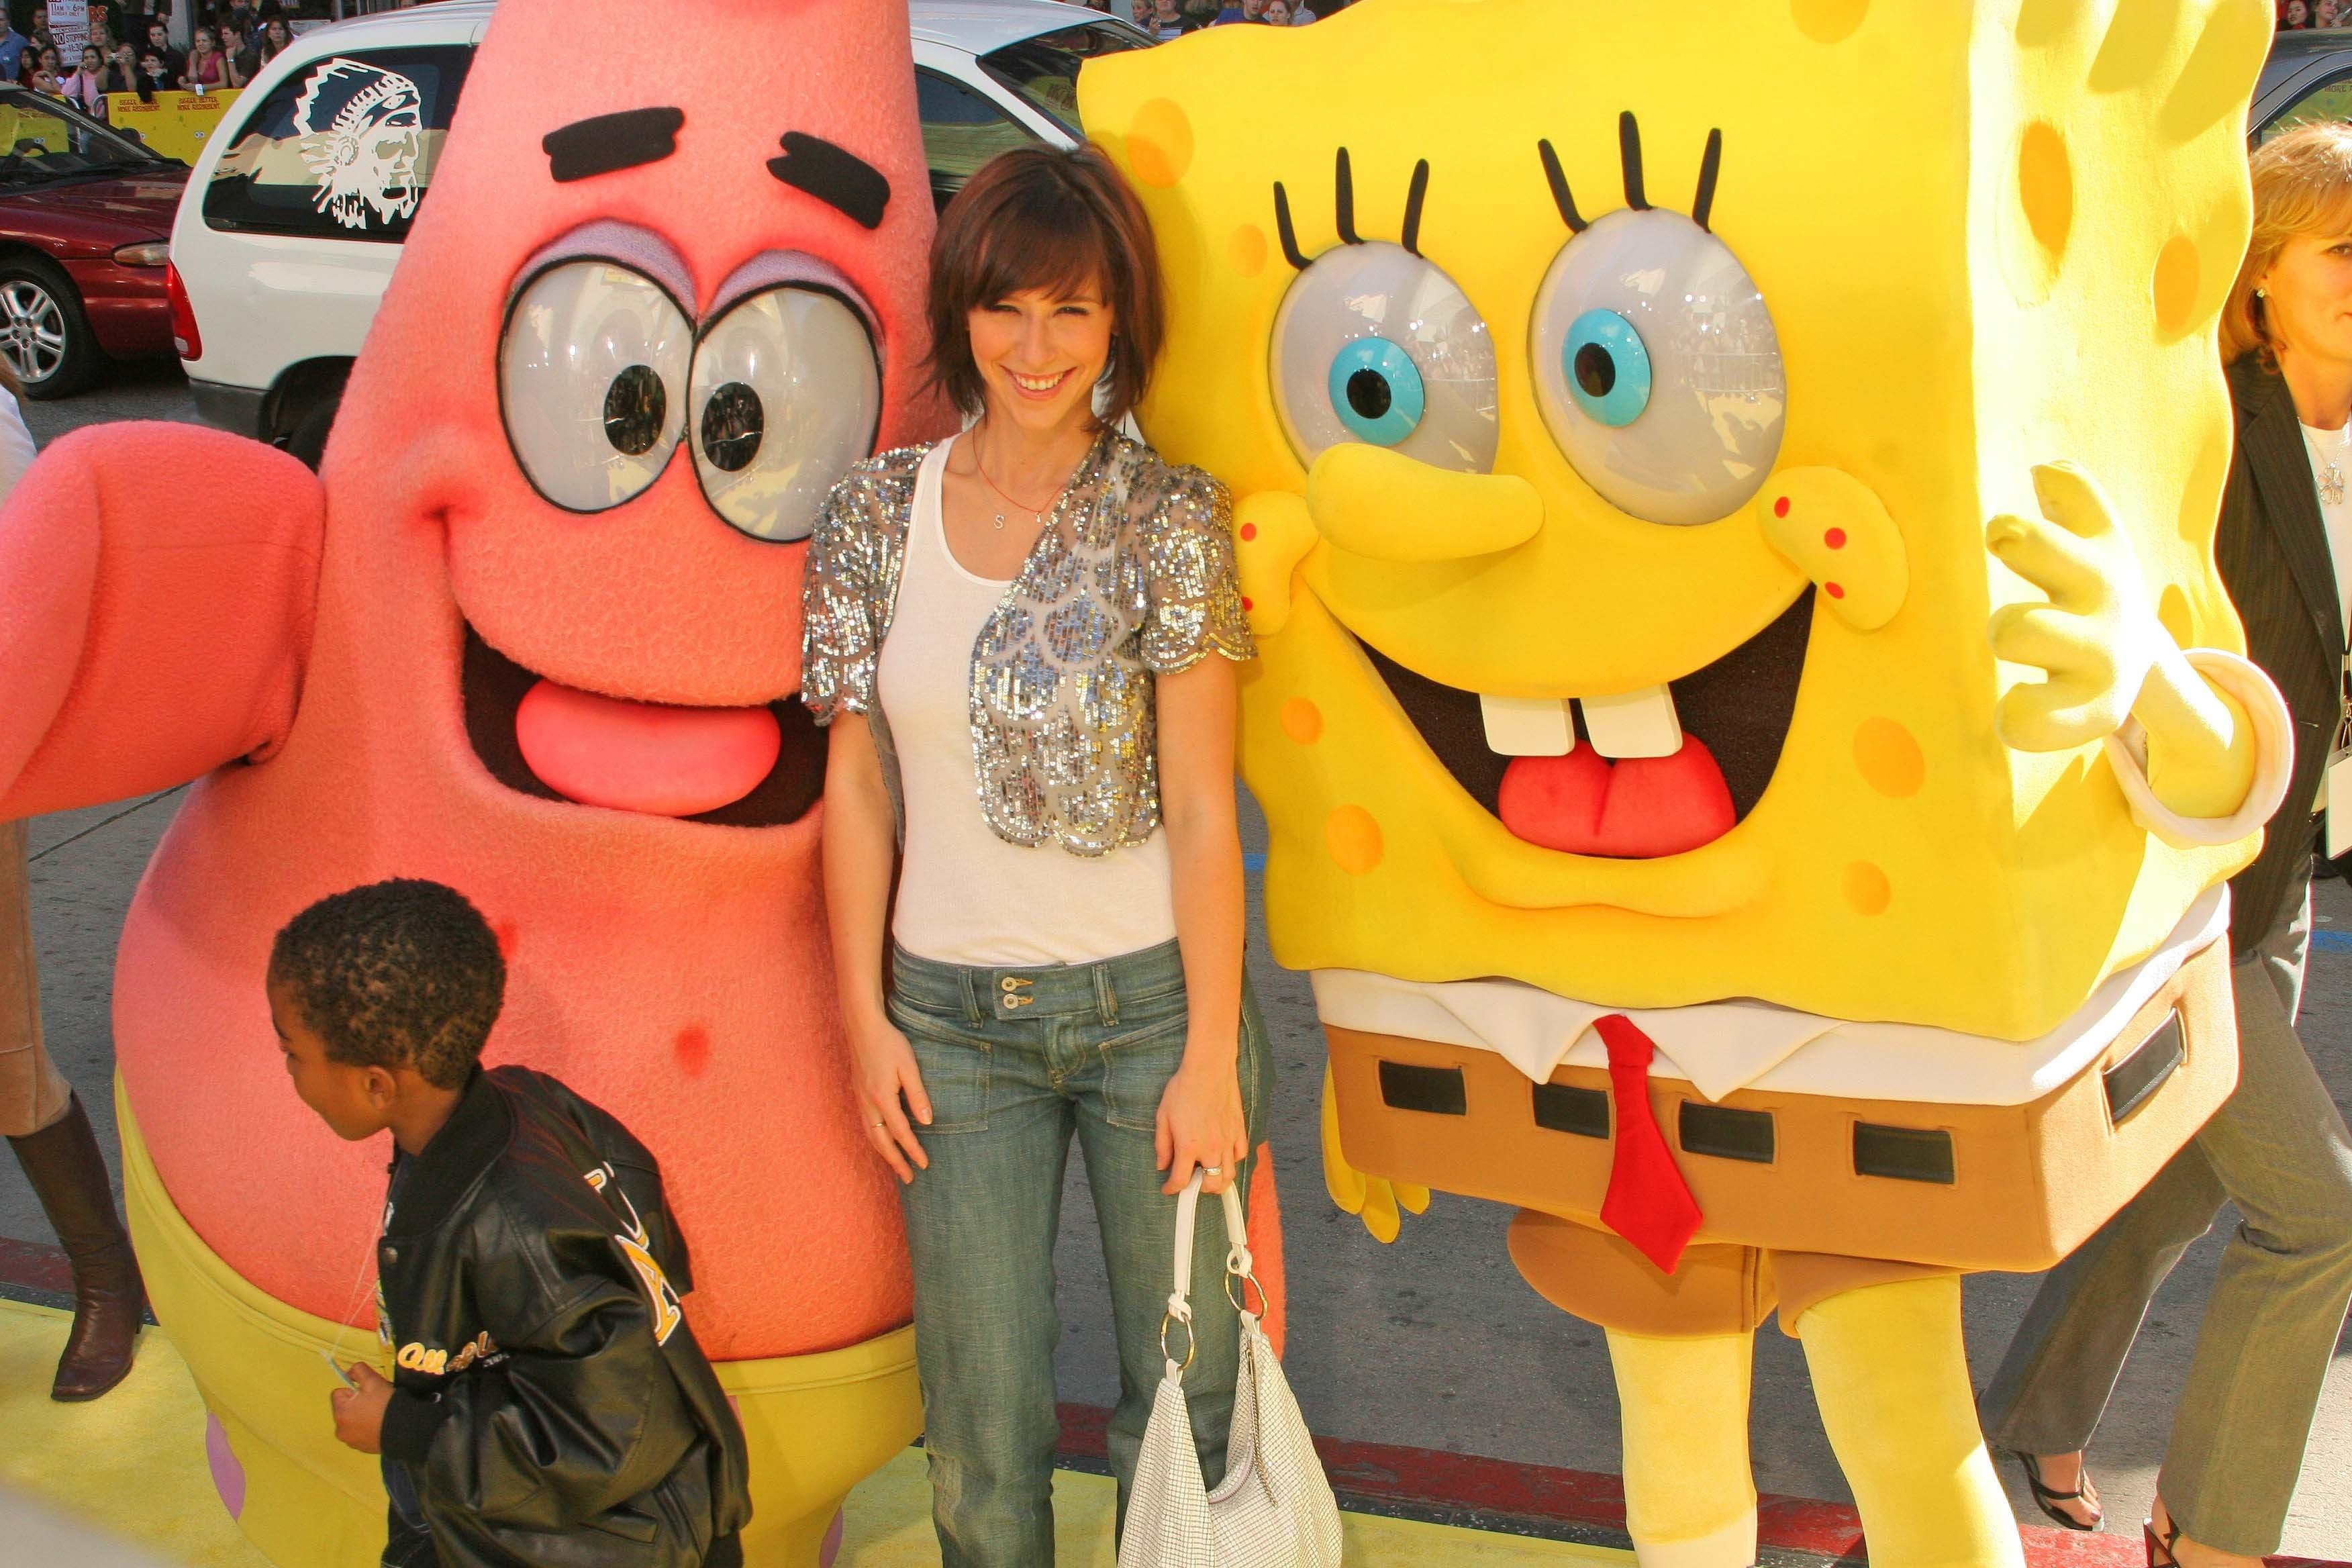 spongebob squarepants musical to open on broadway this fall u2013 the